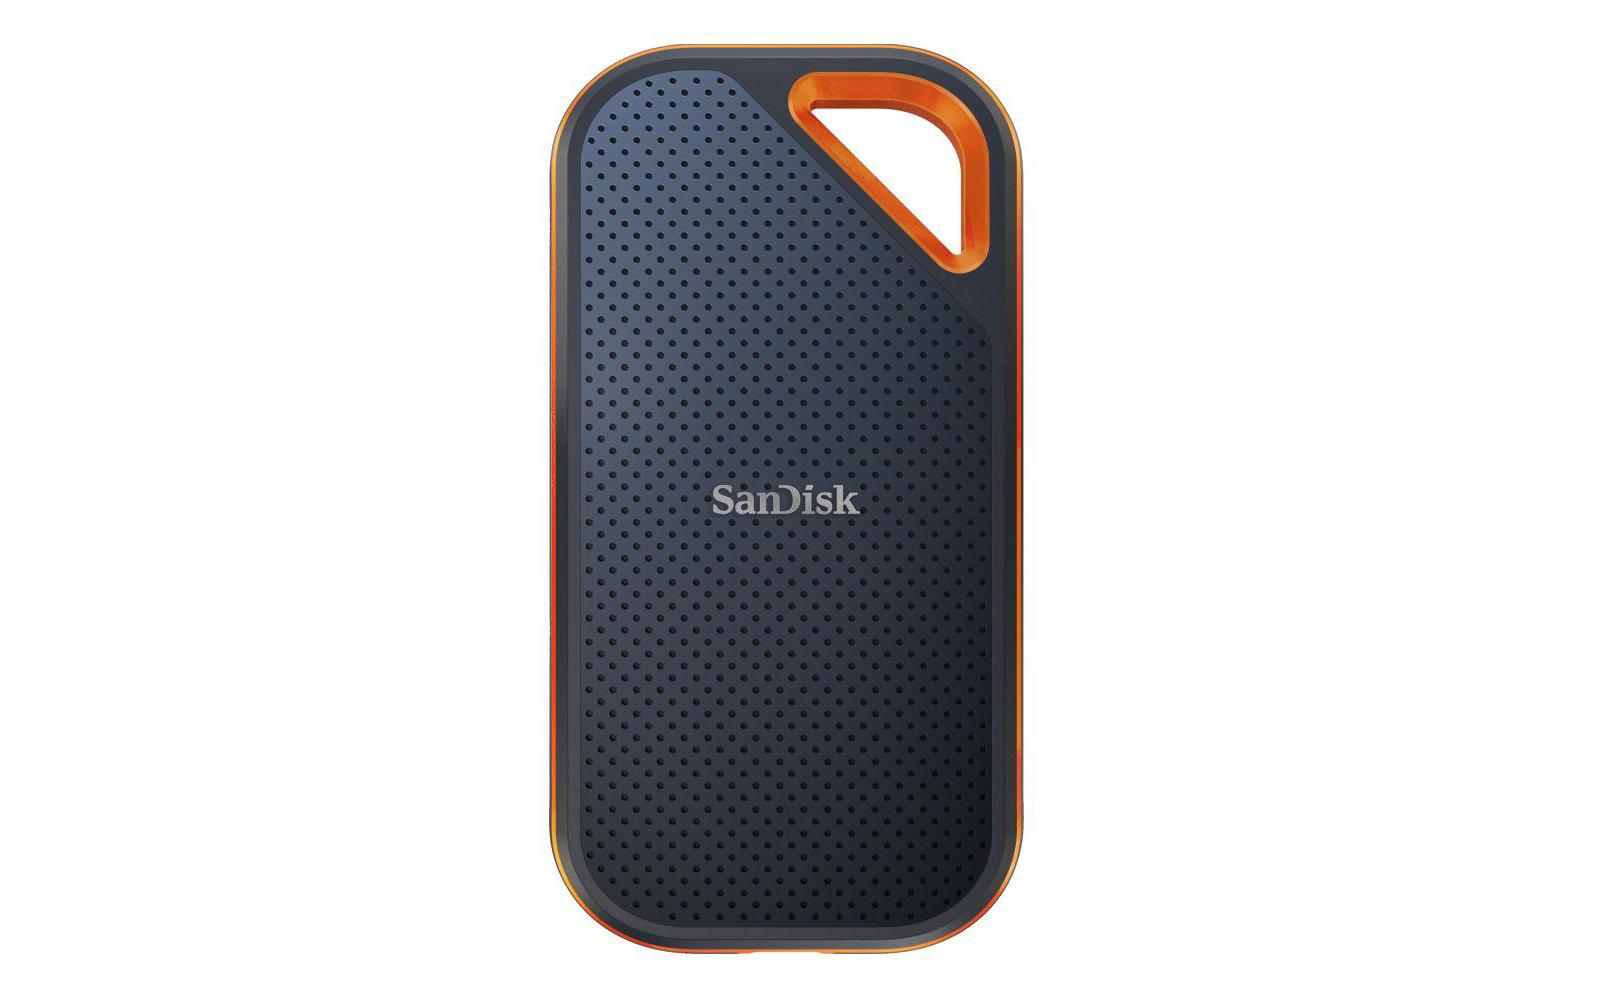 SanDisk-Extreme-Pro-Portable-SSD.jpg